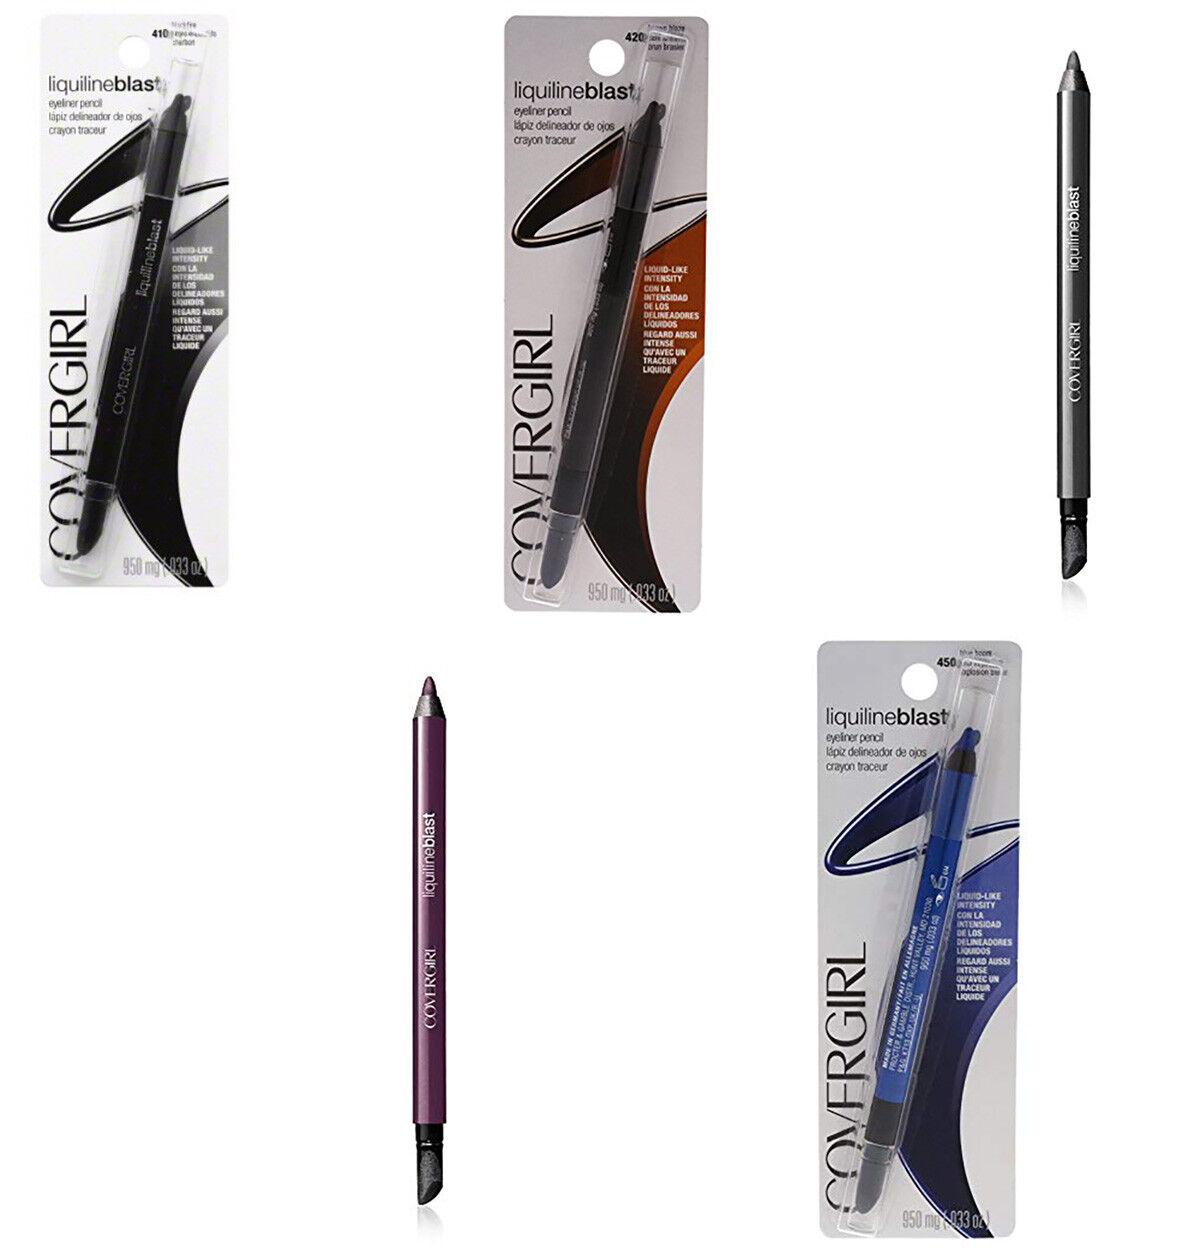 Covergirl Liquiline Blast Eyeliner Pencil NEW Choose Your Sh